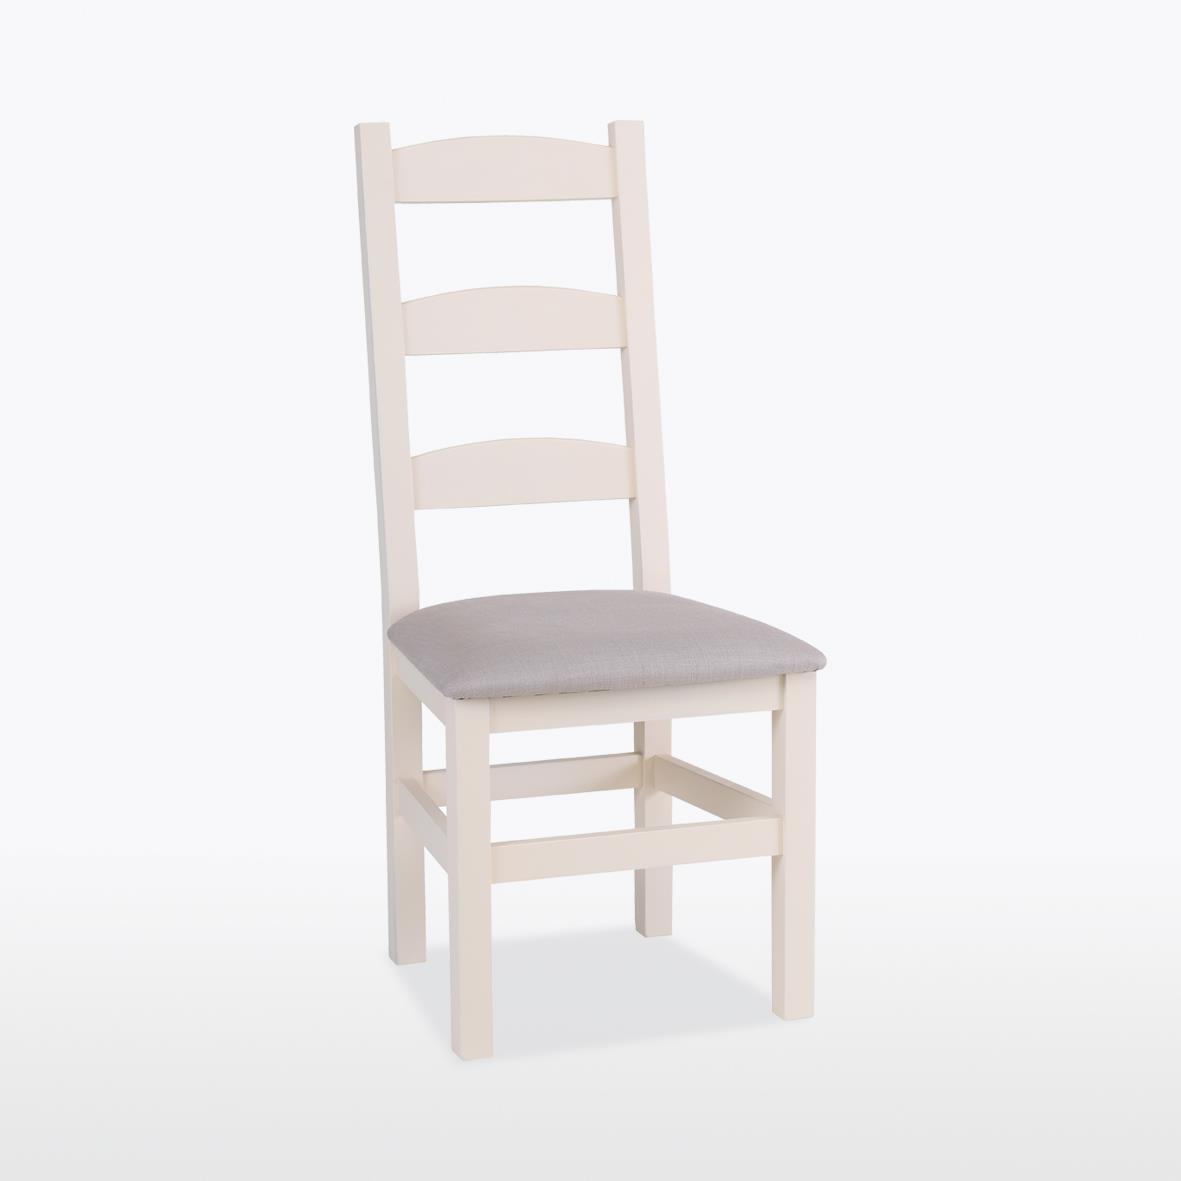 Coelo - Amish Chair